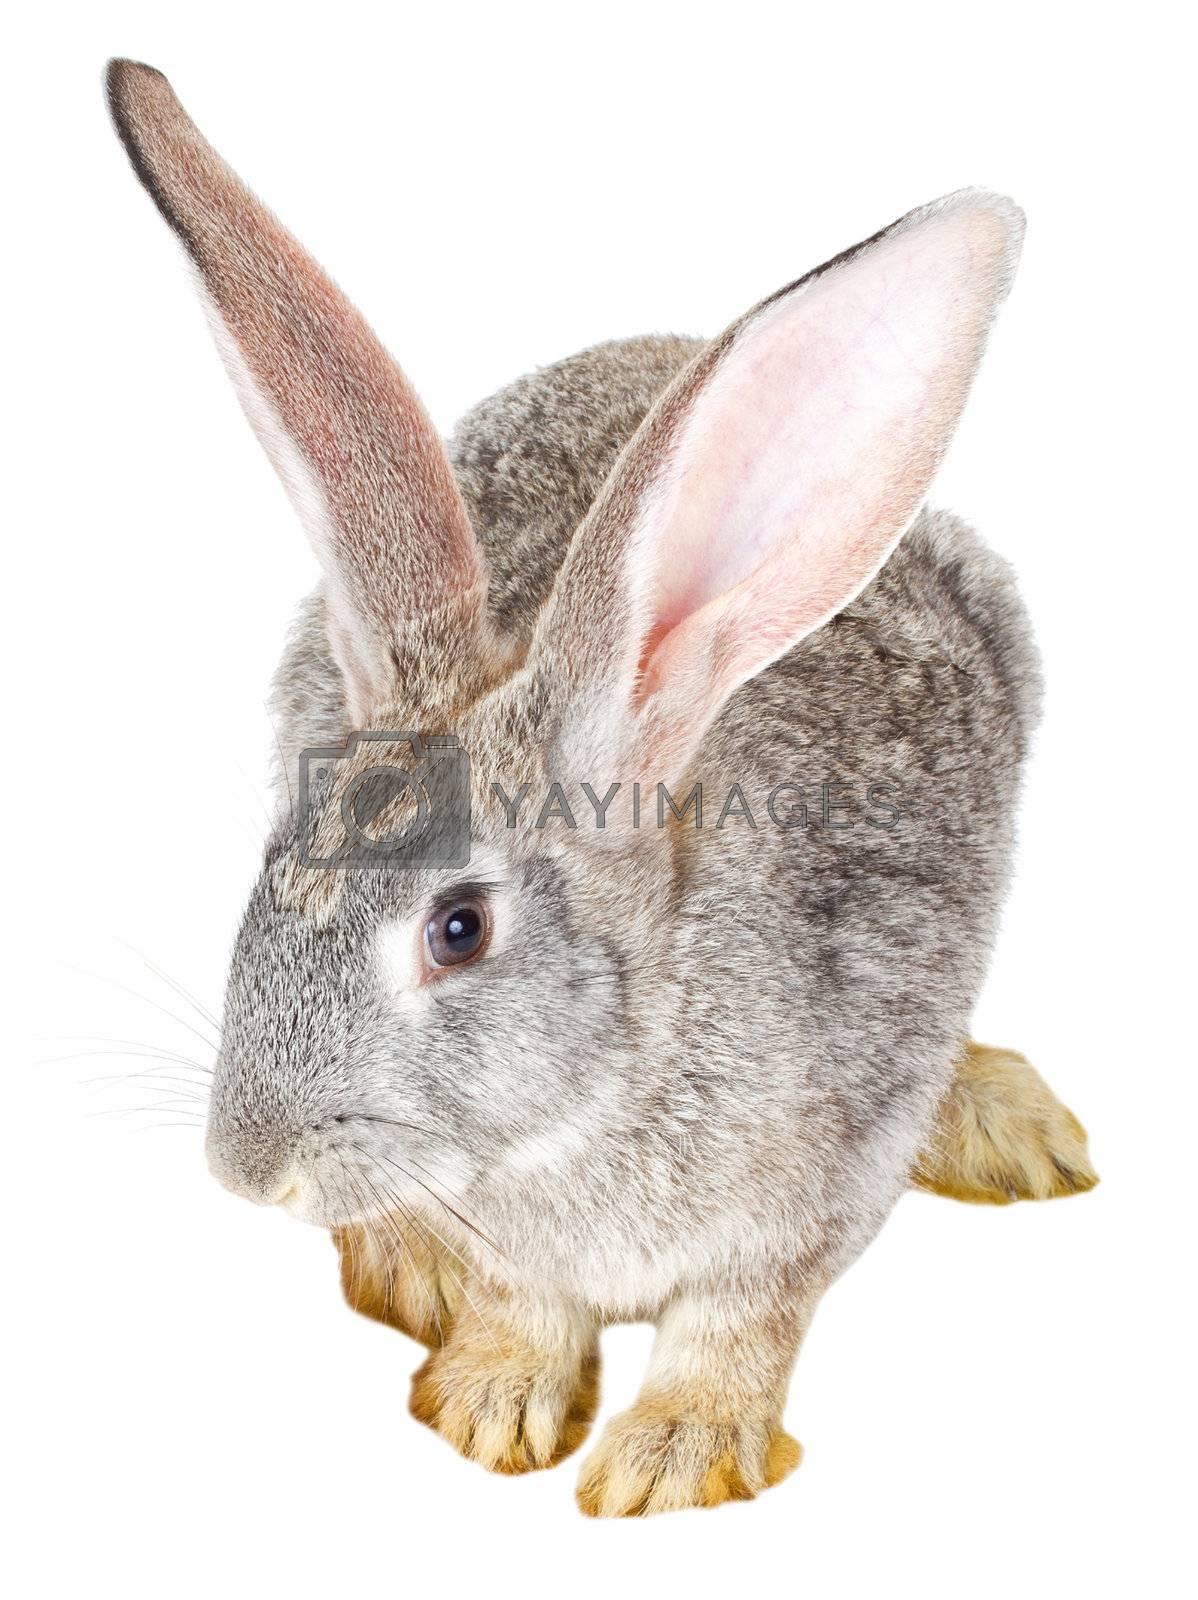 close-up single gray rabbit, isolated on white